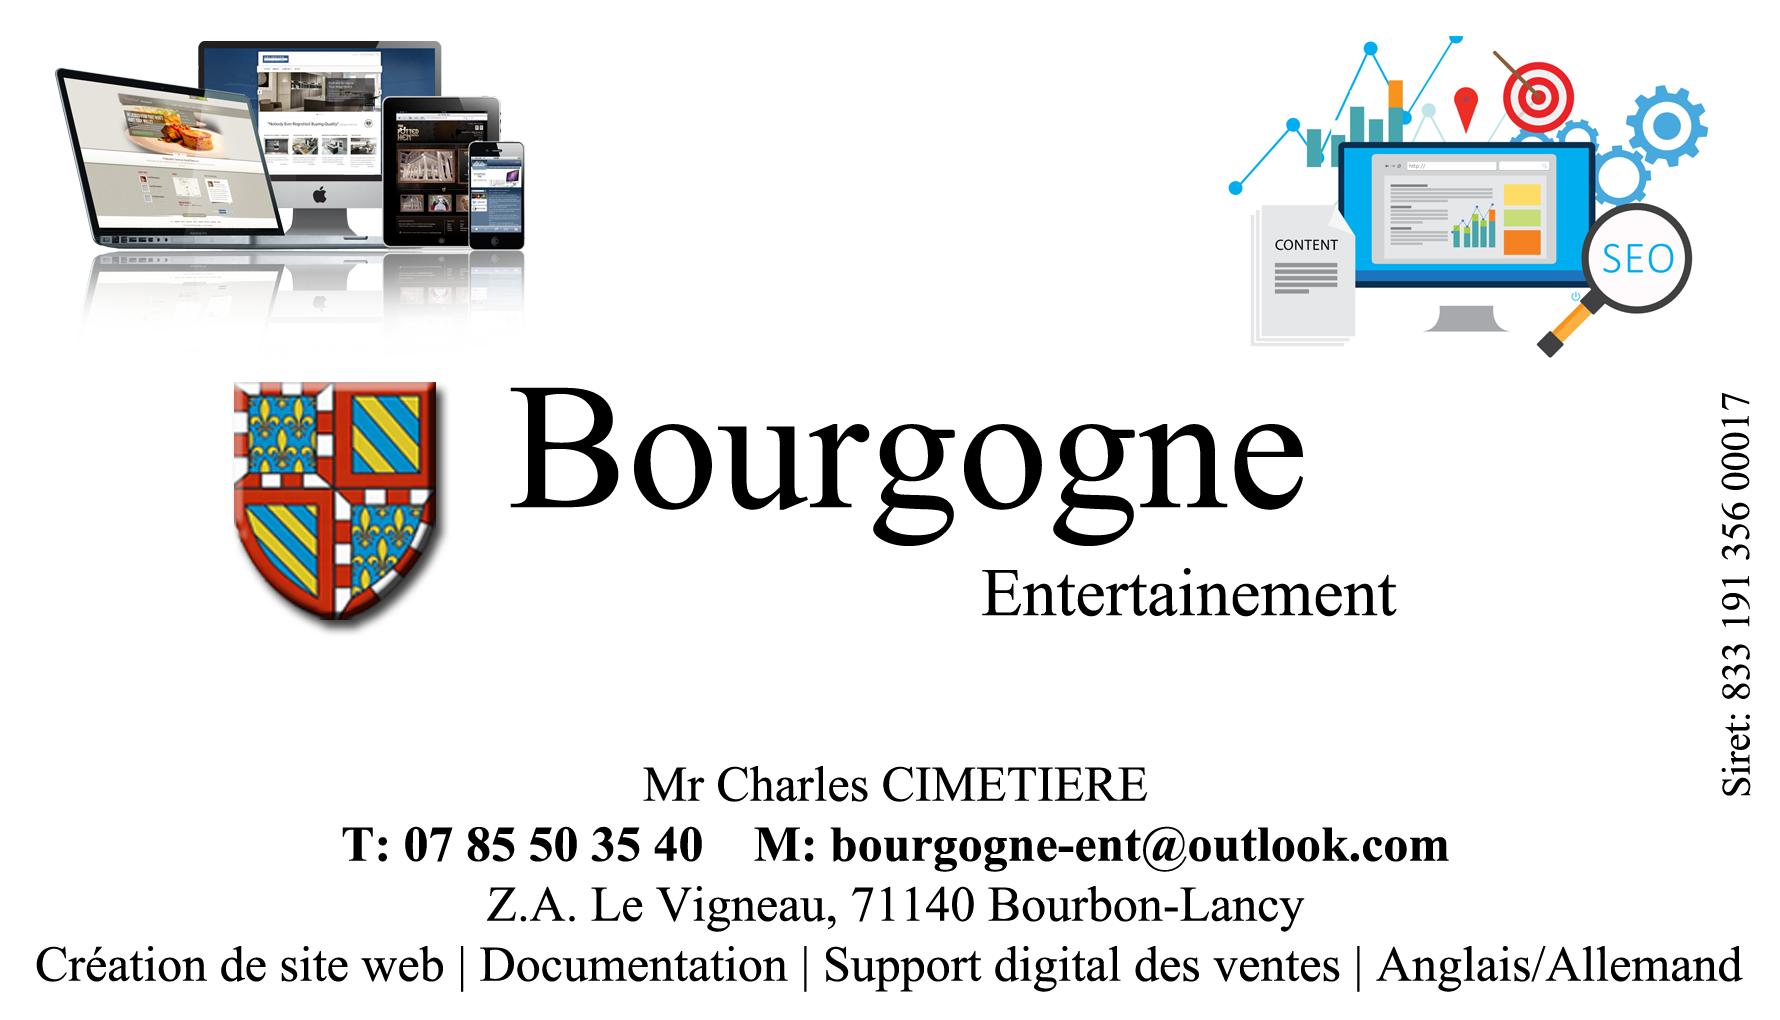 business card Bourgogne entertainment Juillet 2018.png